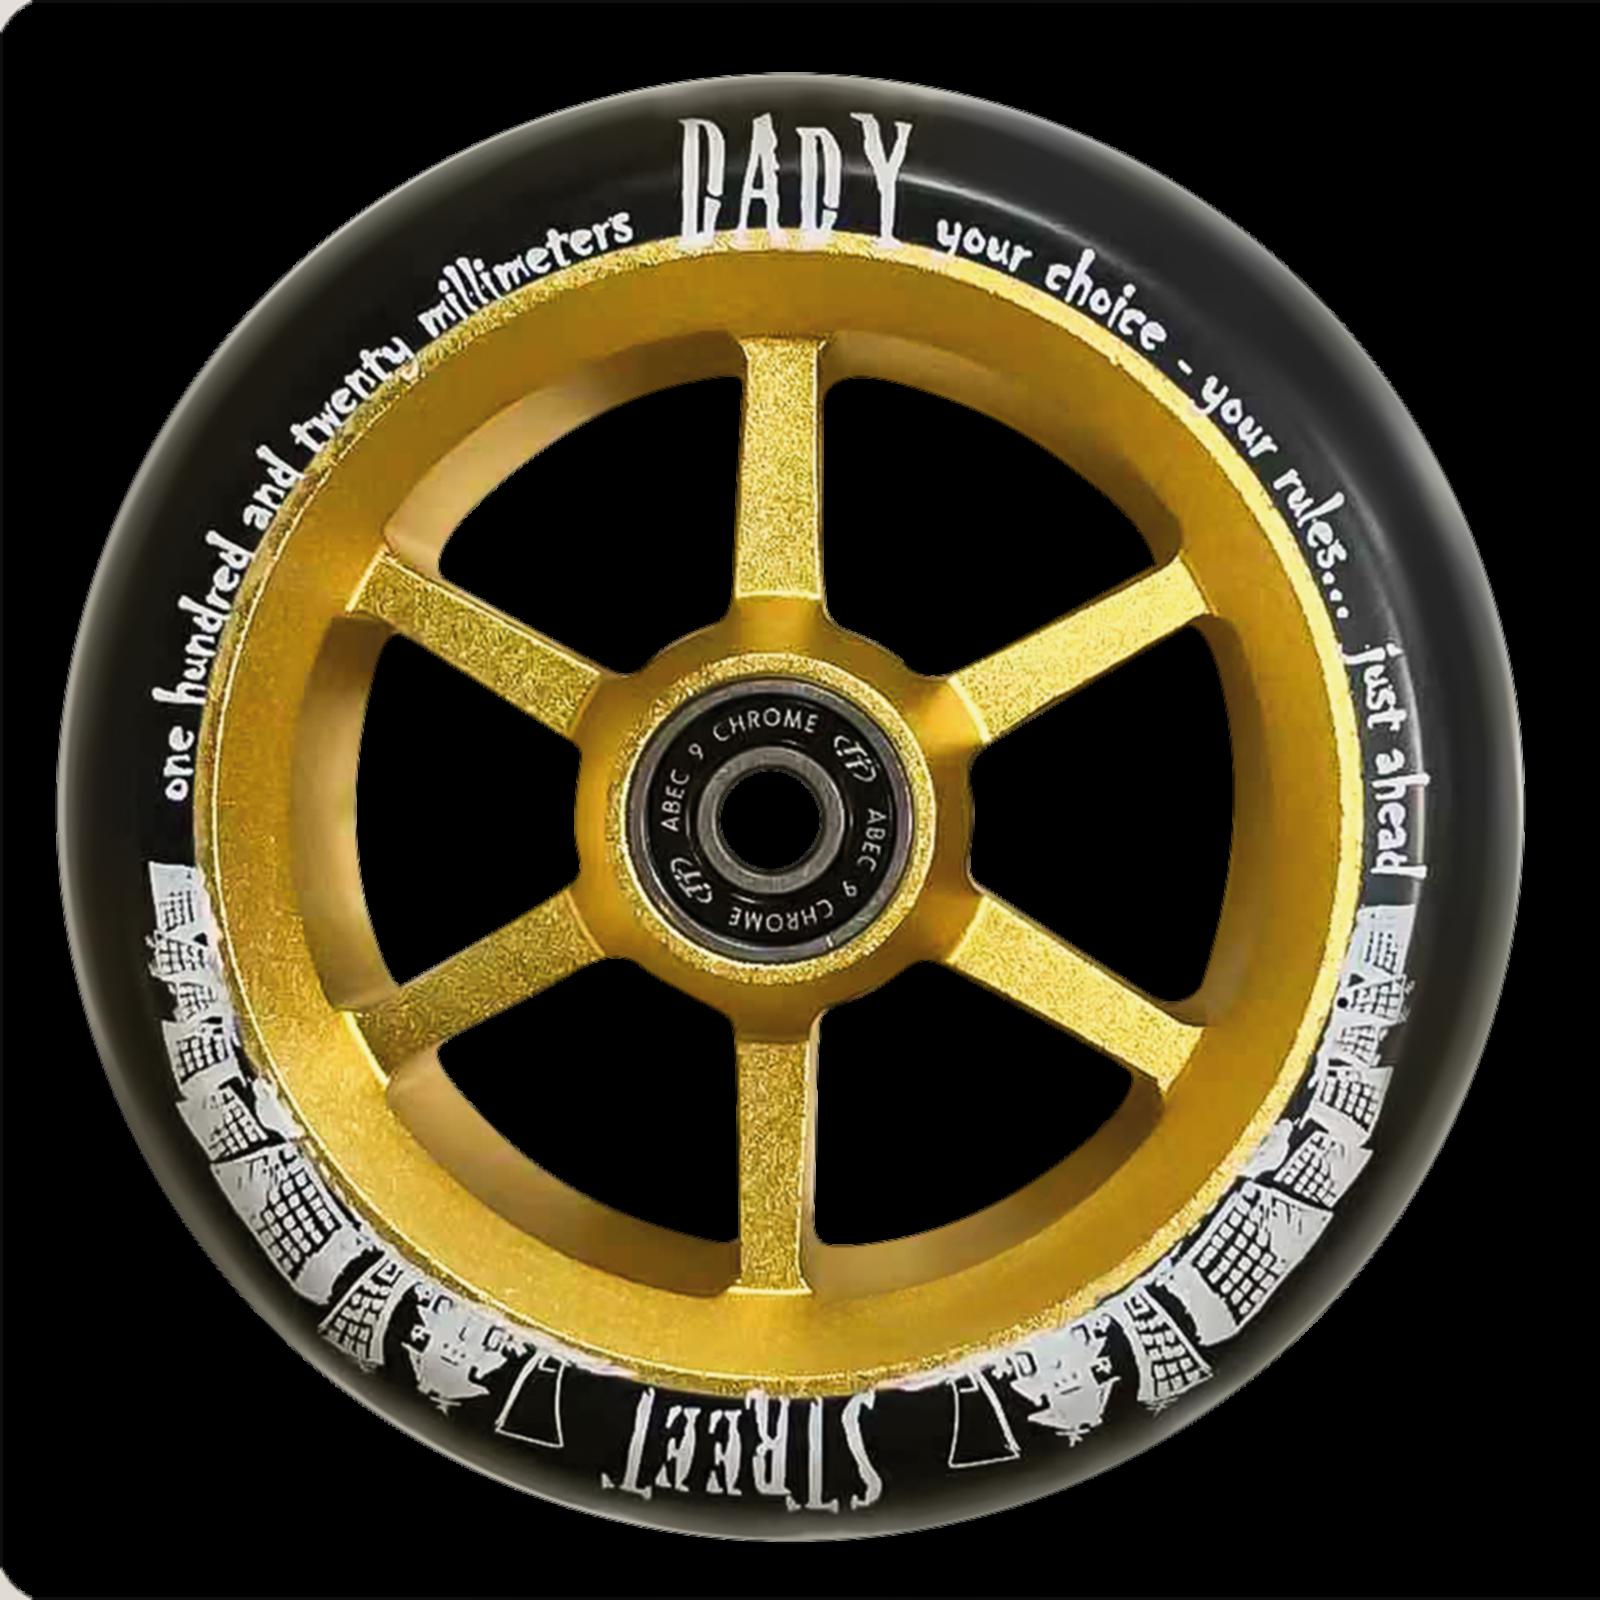 Колесо для трюкового самоката TechTeam 6ST 120 mm Street Dady золото